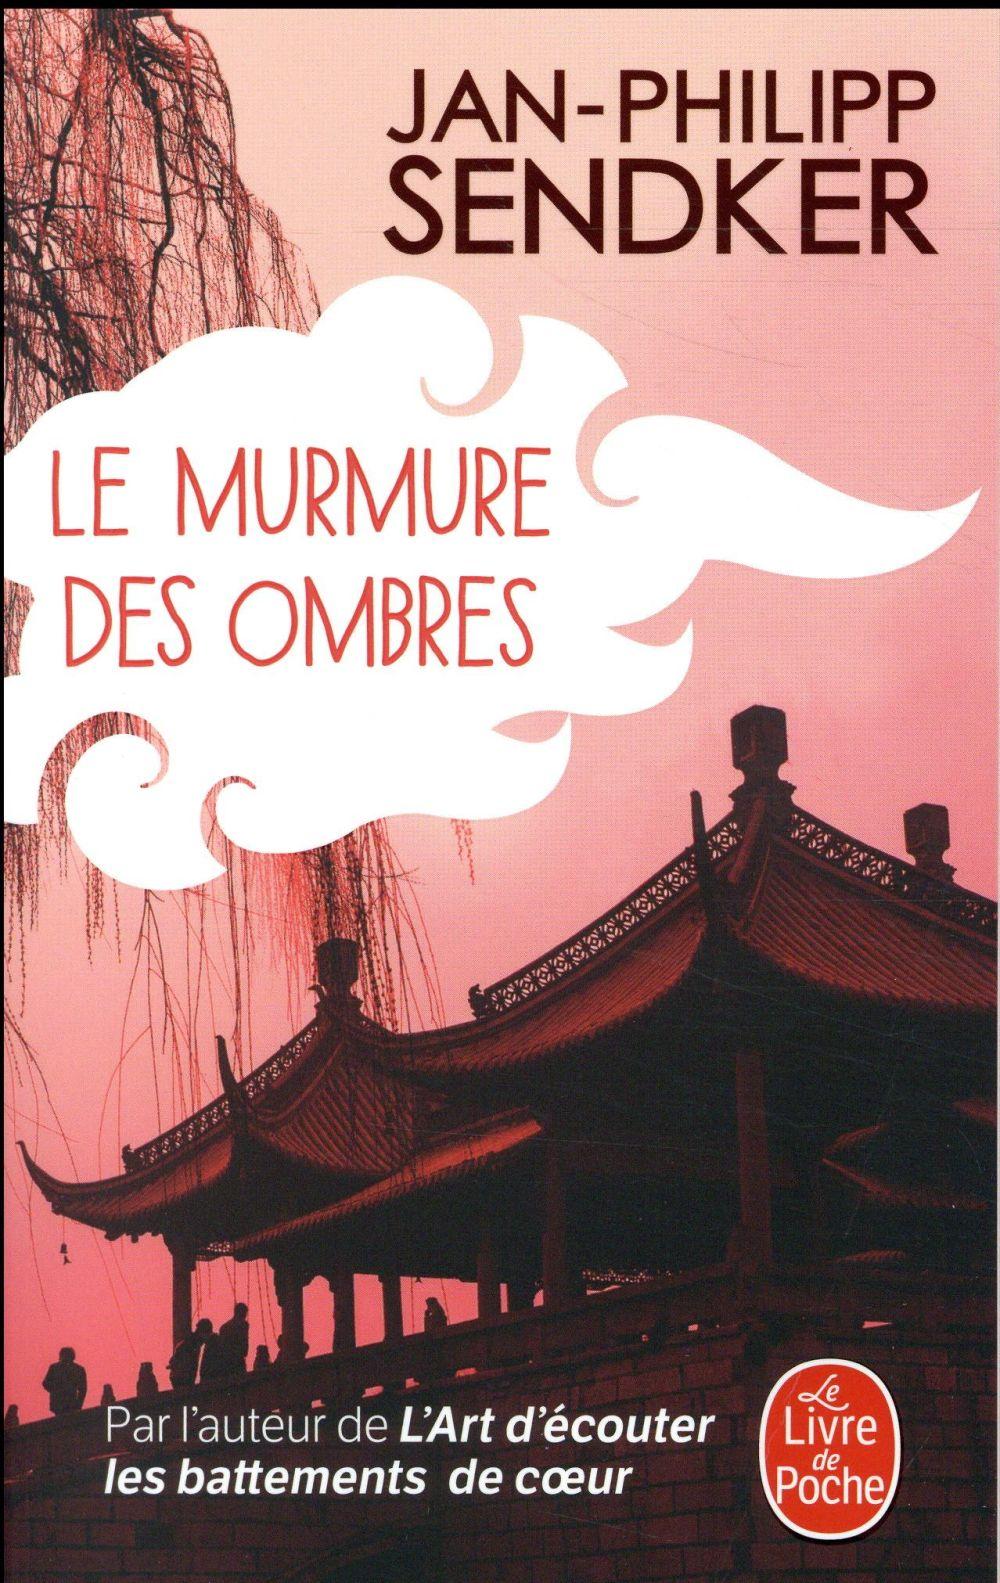 LE MURMURE DES OMBRES